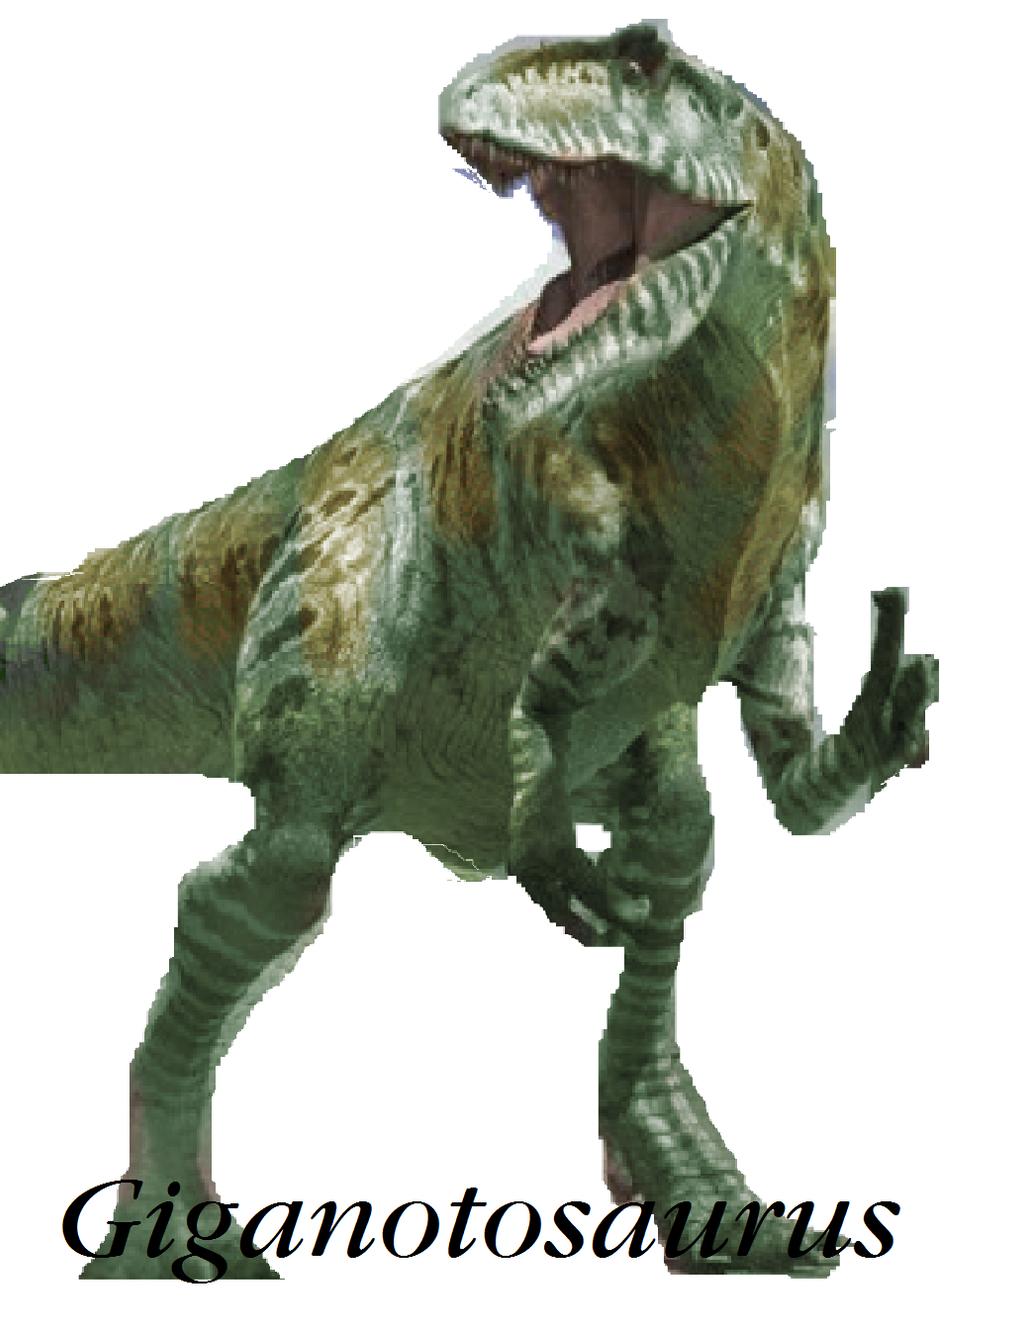 Dinosaur Train Giganotosaurus in real form by Vespisaurus ...